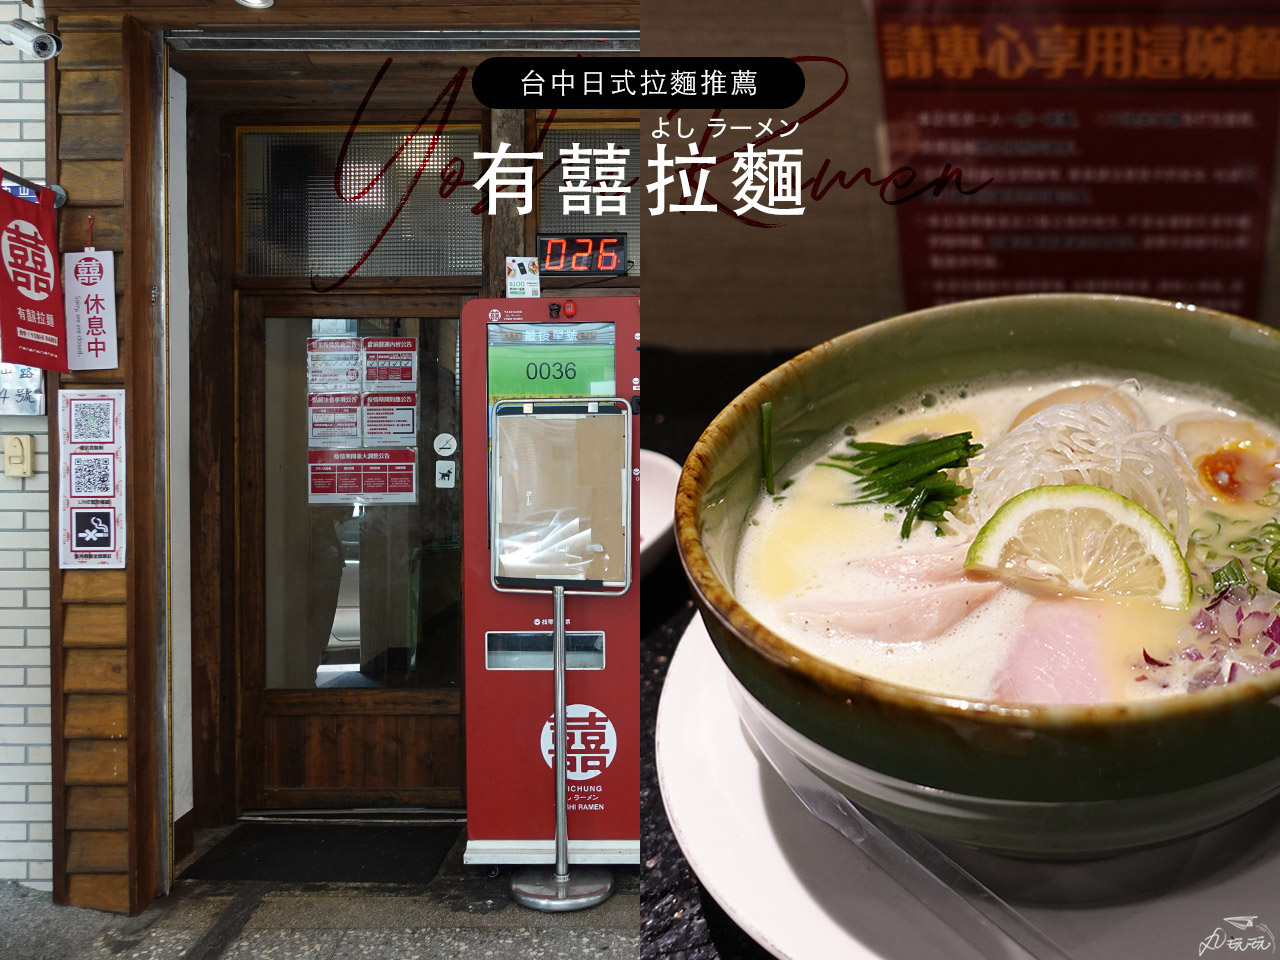 Read more about the article 有囍拉麵|雞白湯專賣 朝聖台中拉麵愛好會票選名店